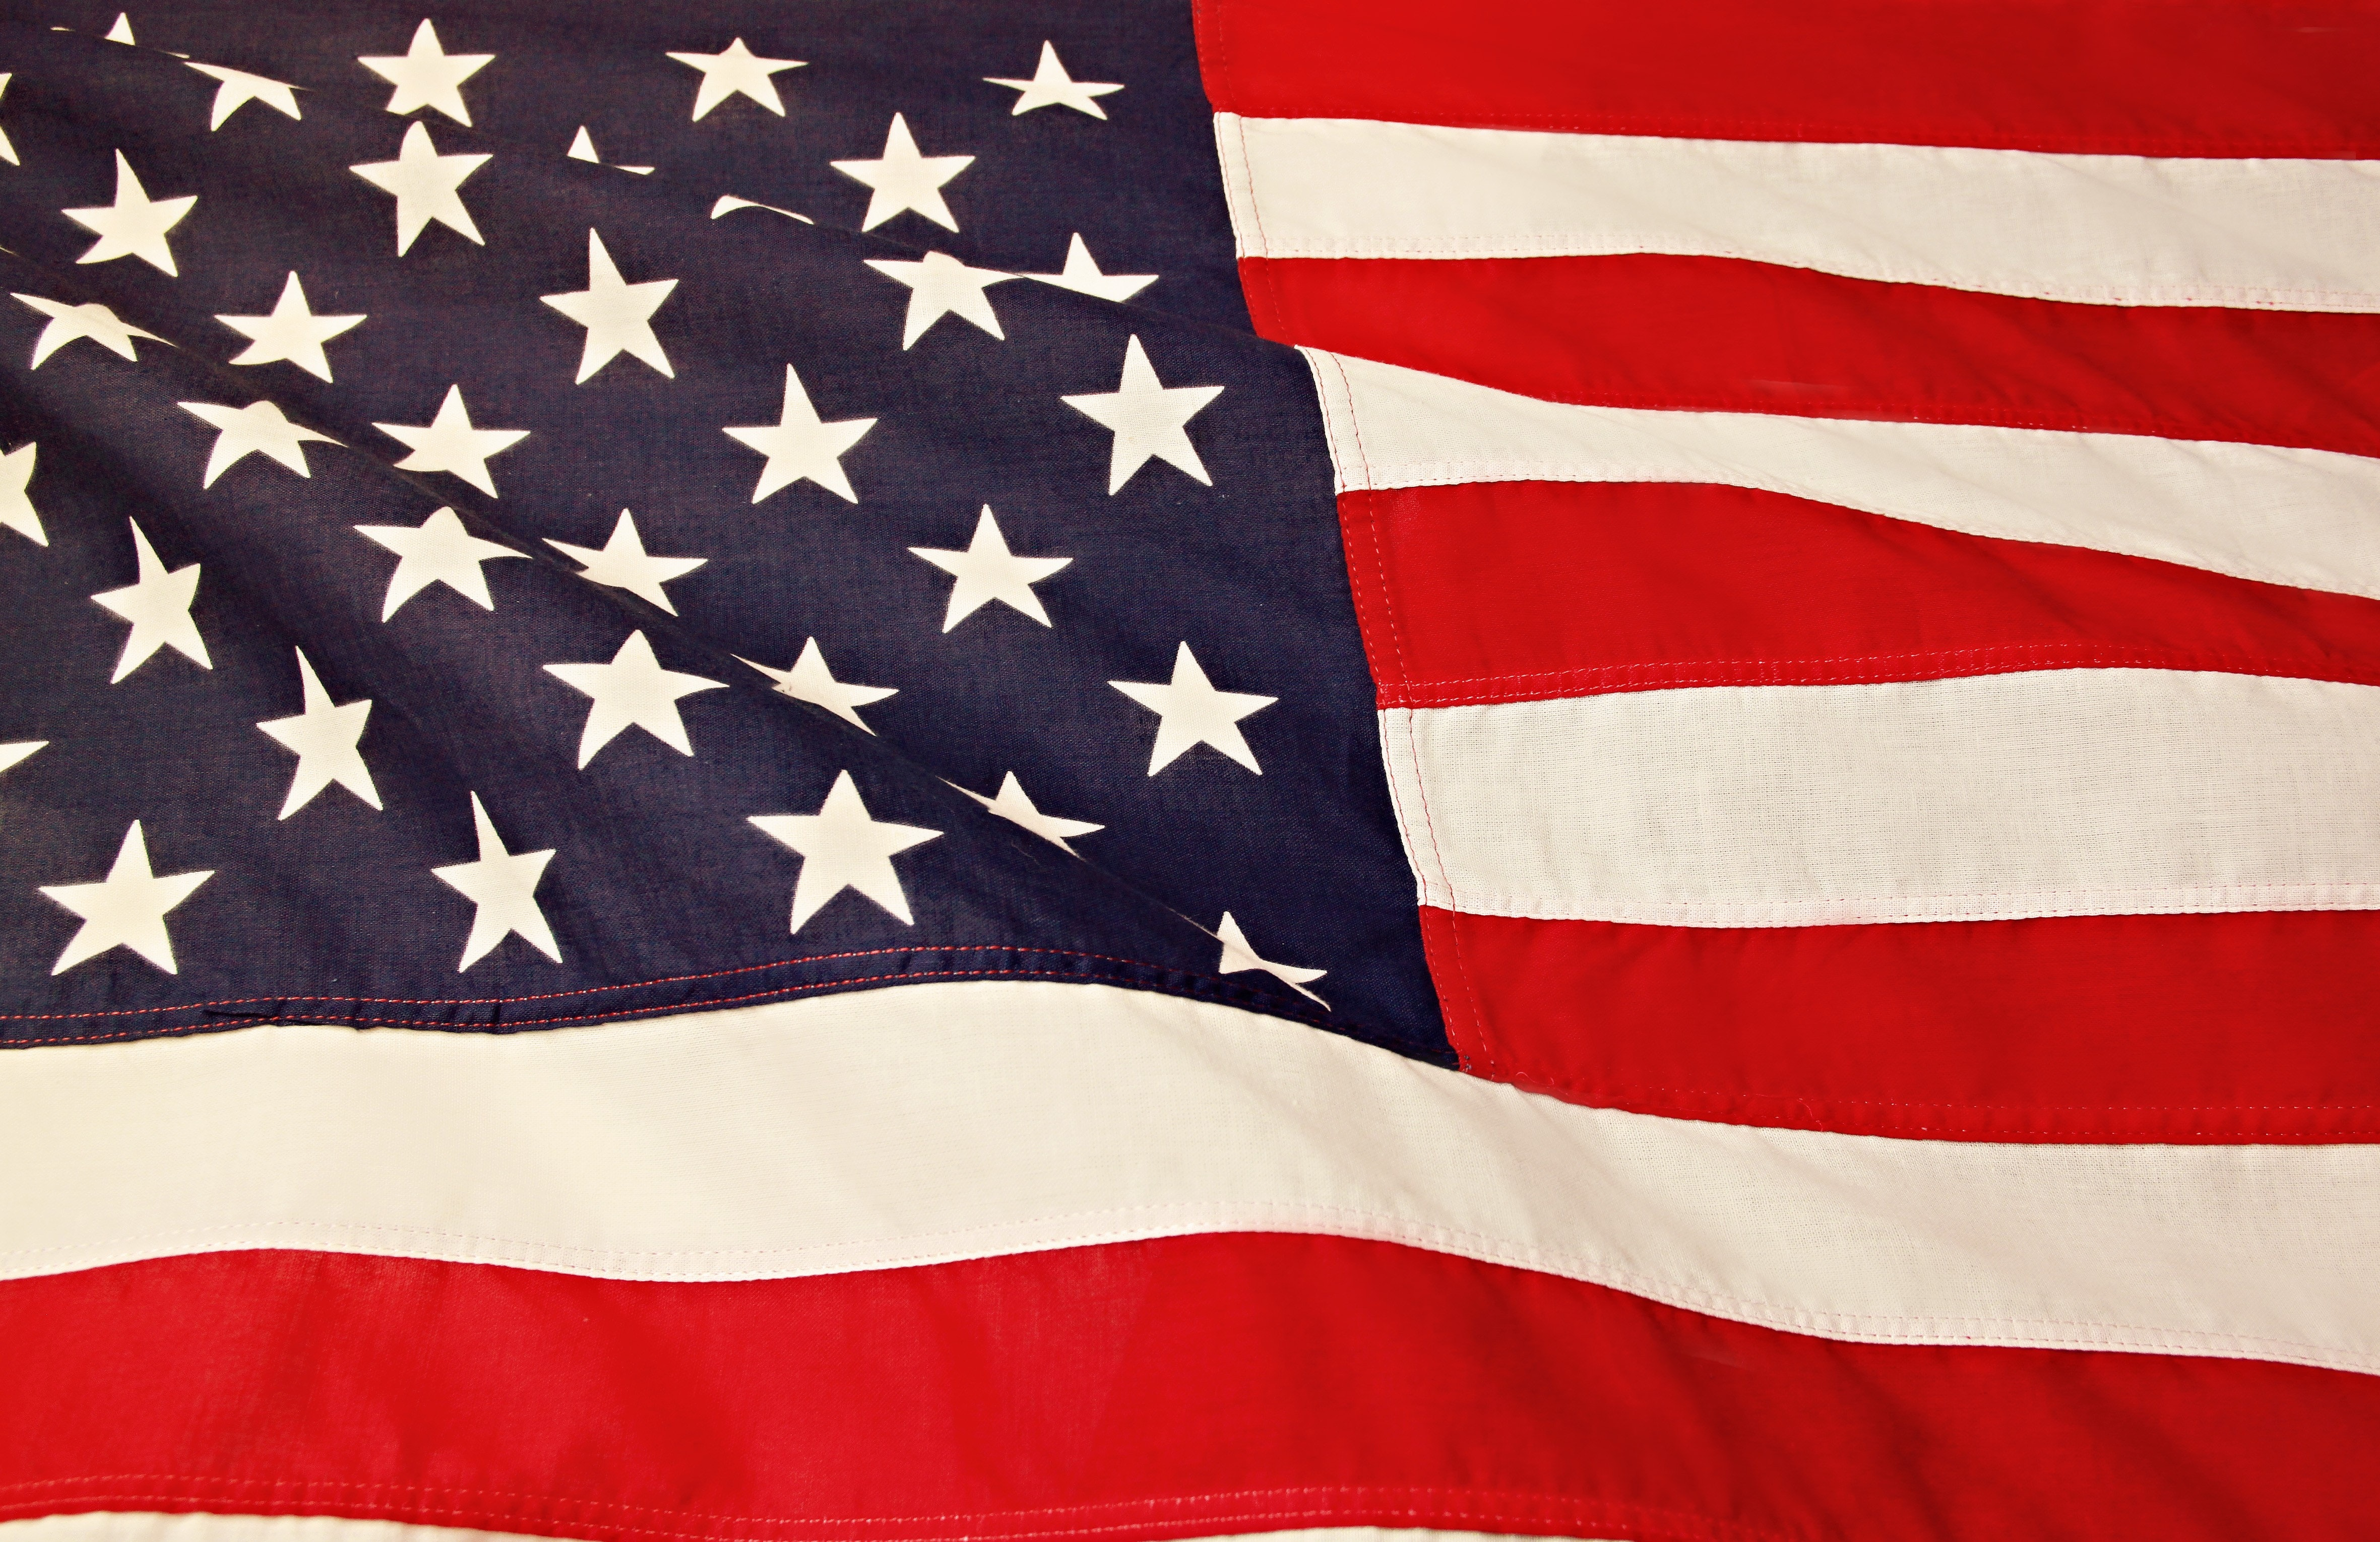 administration-america-american-flag-1202723